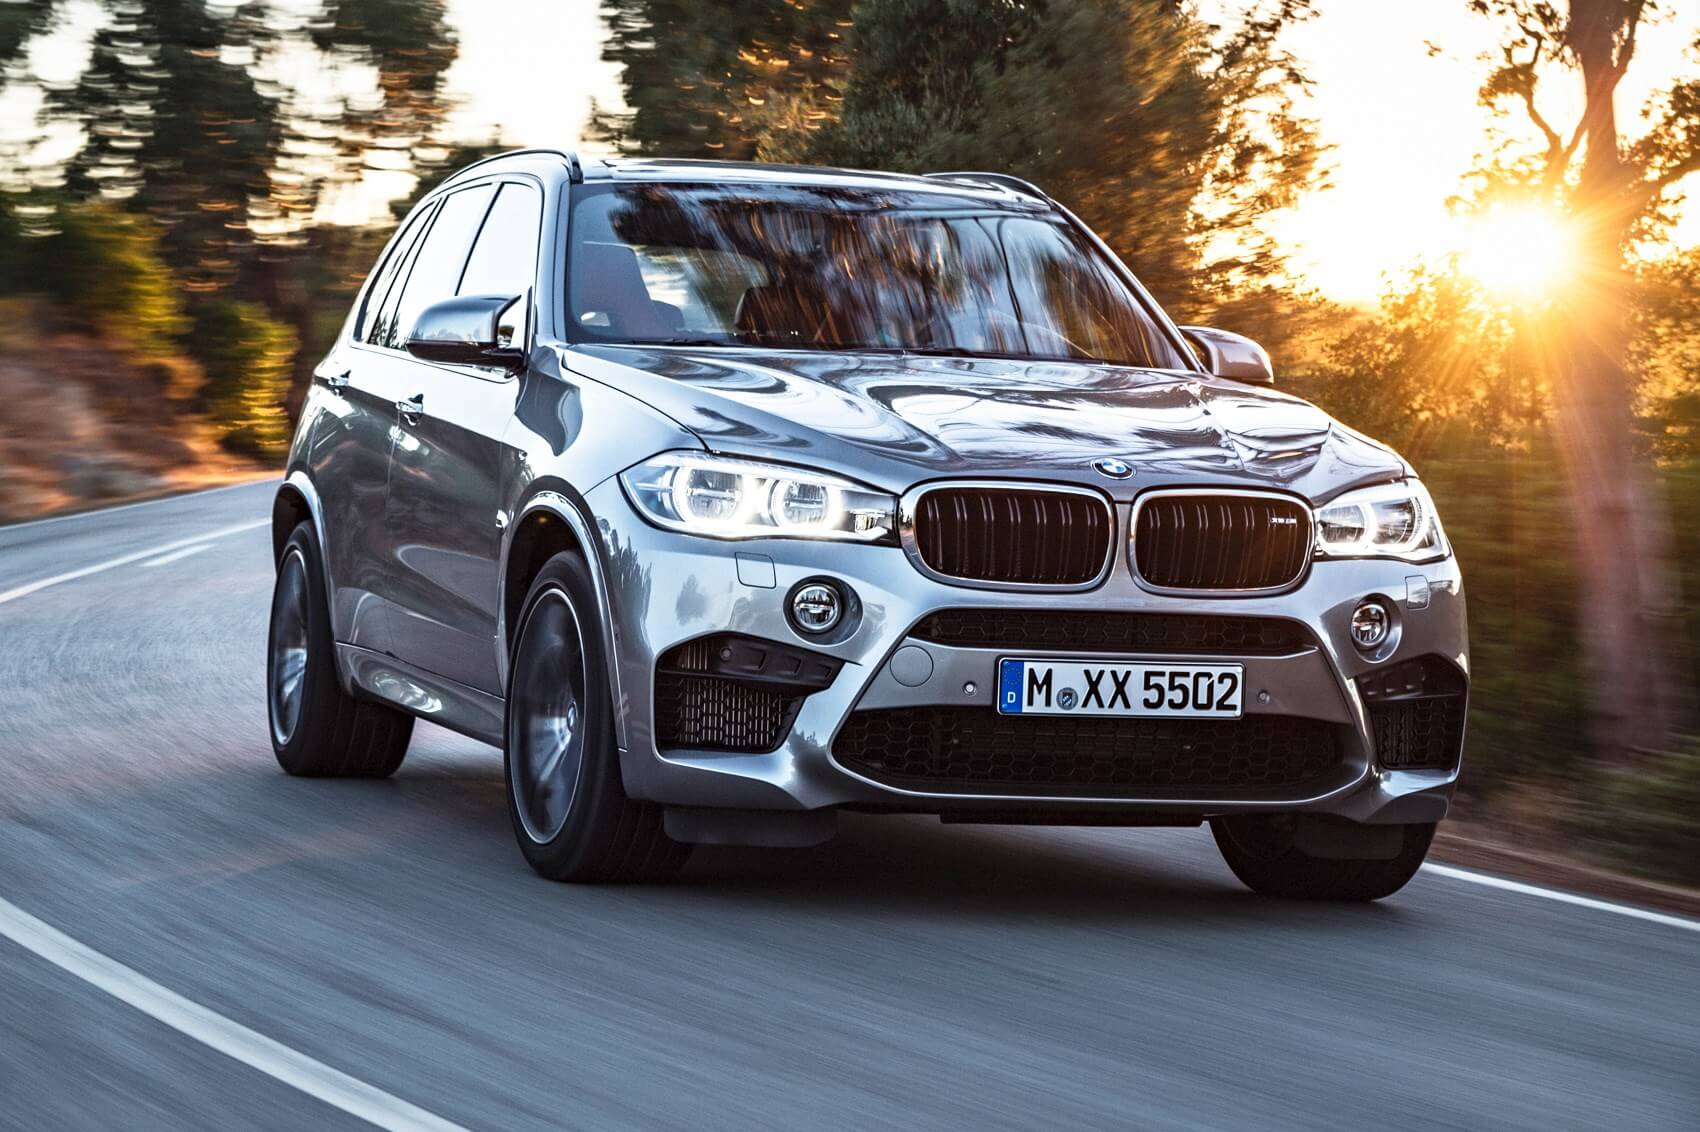 BMW X5 M 4.4 4x4 V8 32V Bi-Turbo Aut.